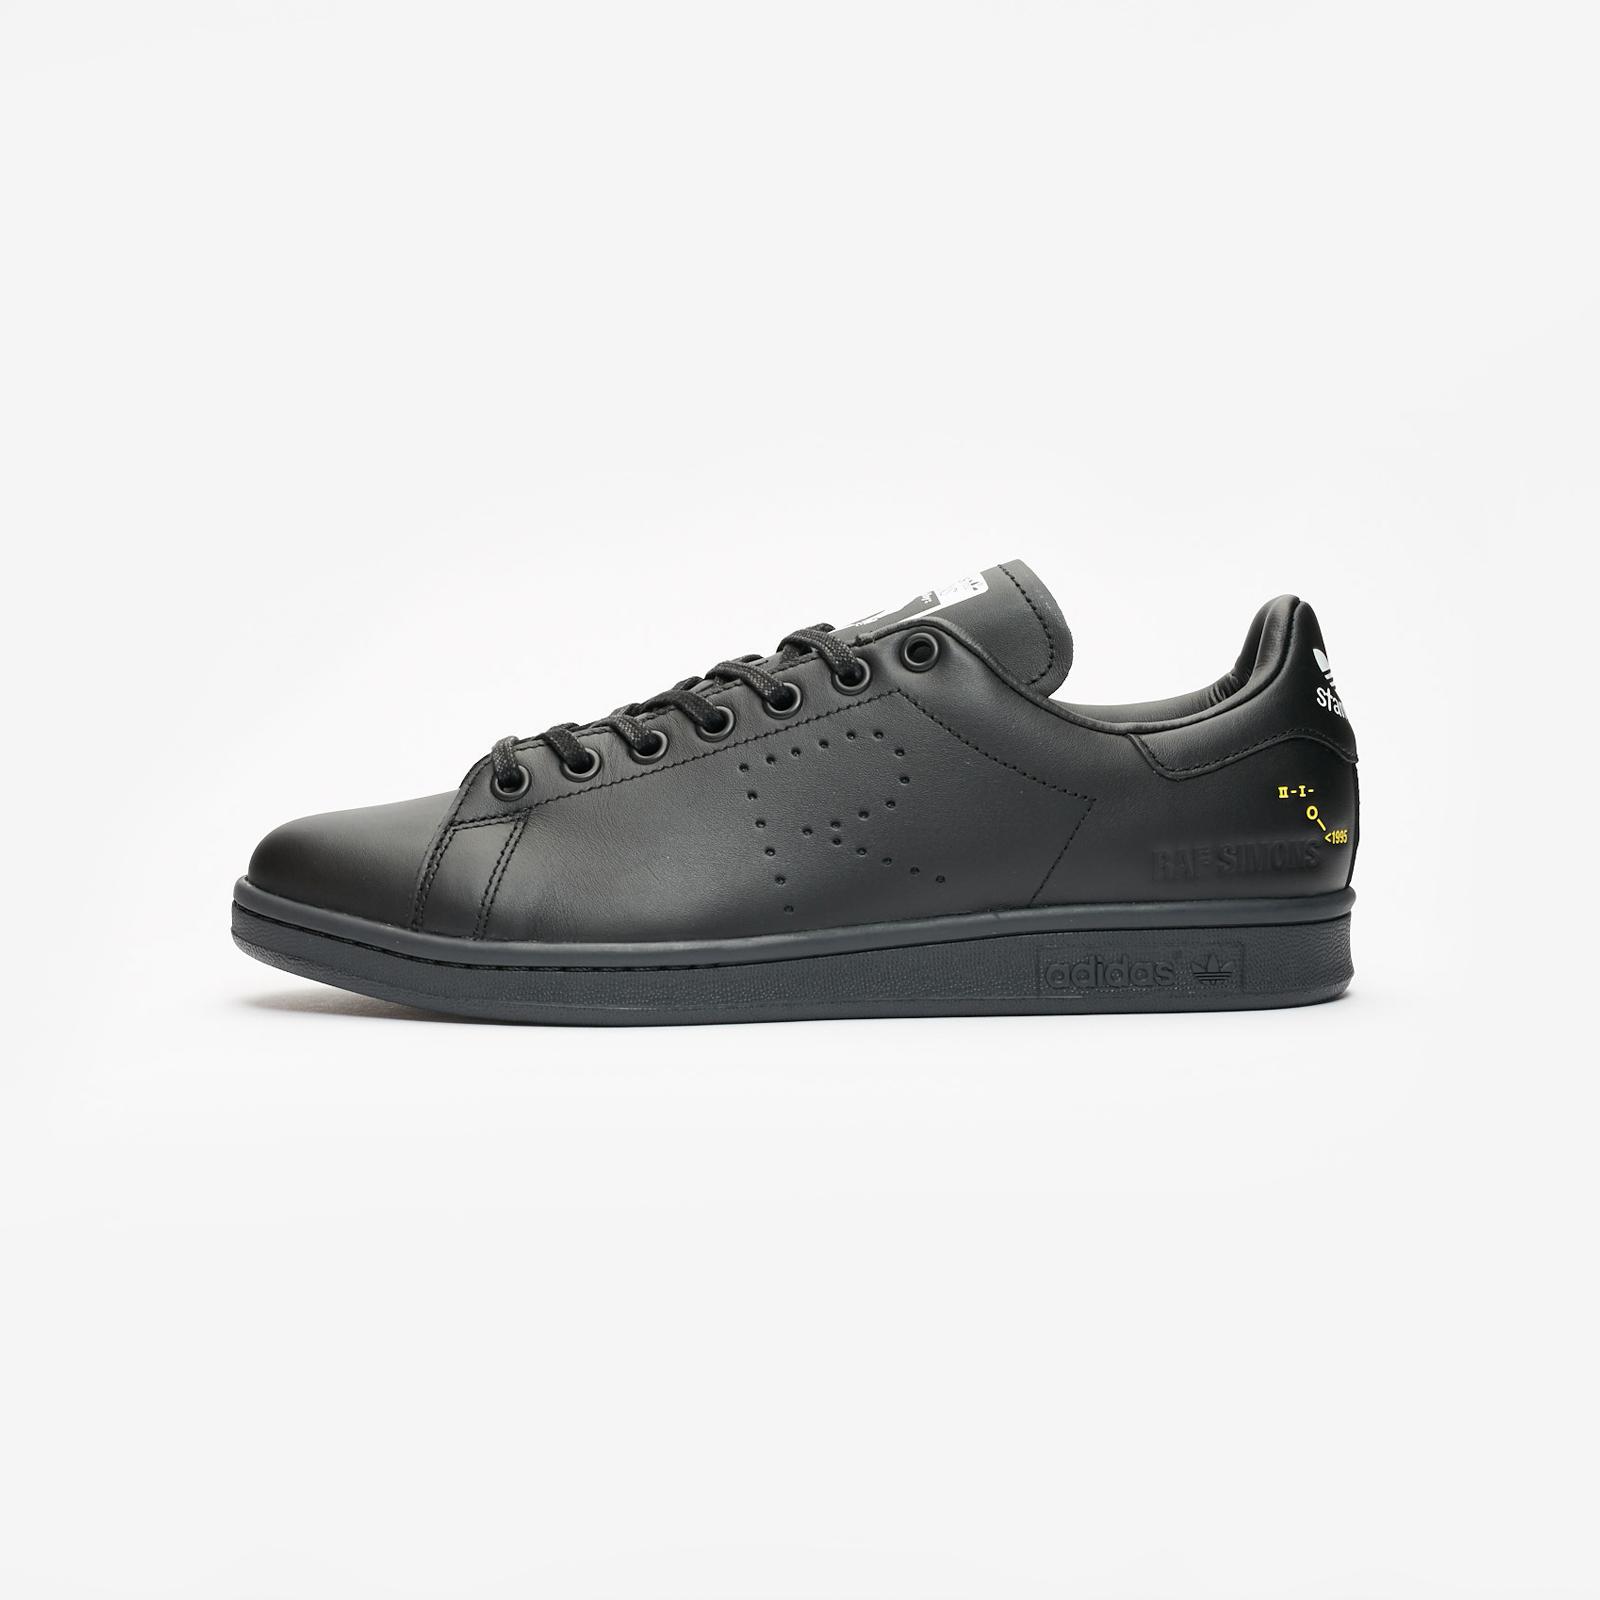 3ca2b6d50bec adidas Raf Simons Stan Smith - F34257 - Sneakersnstuff